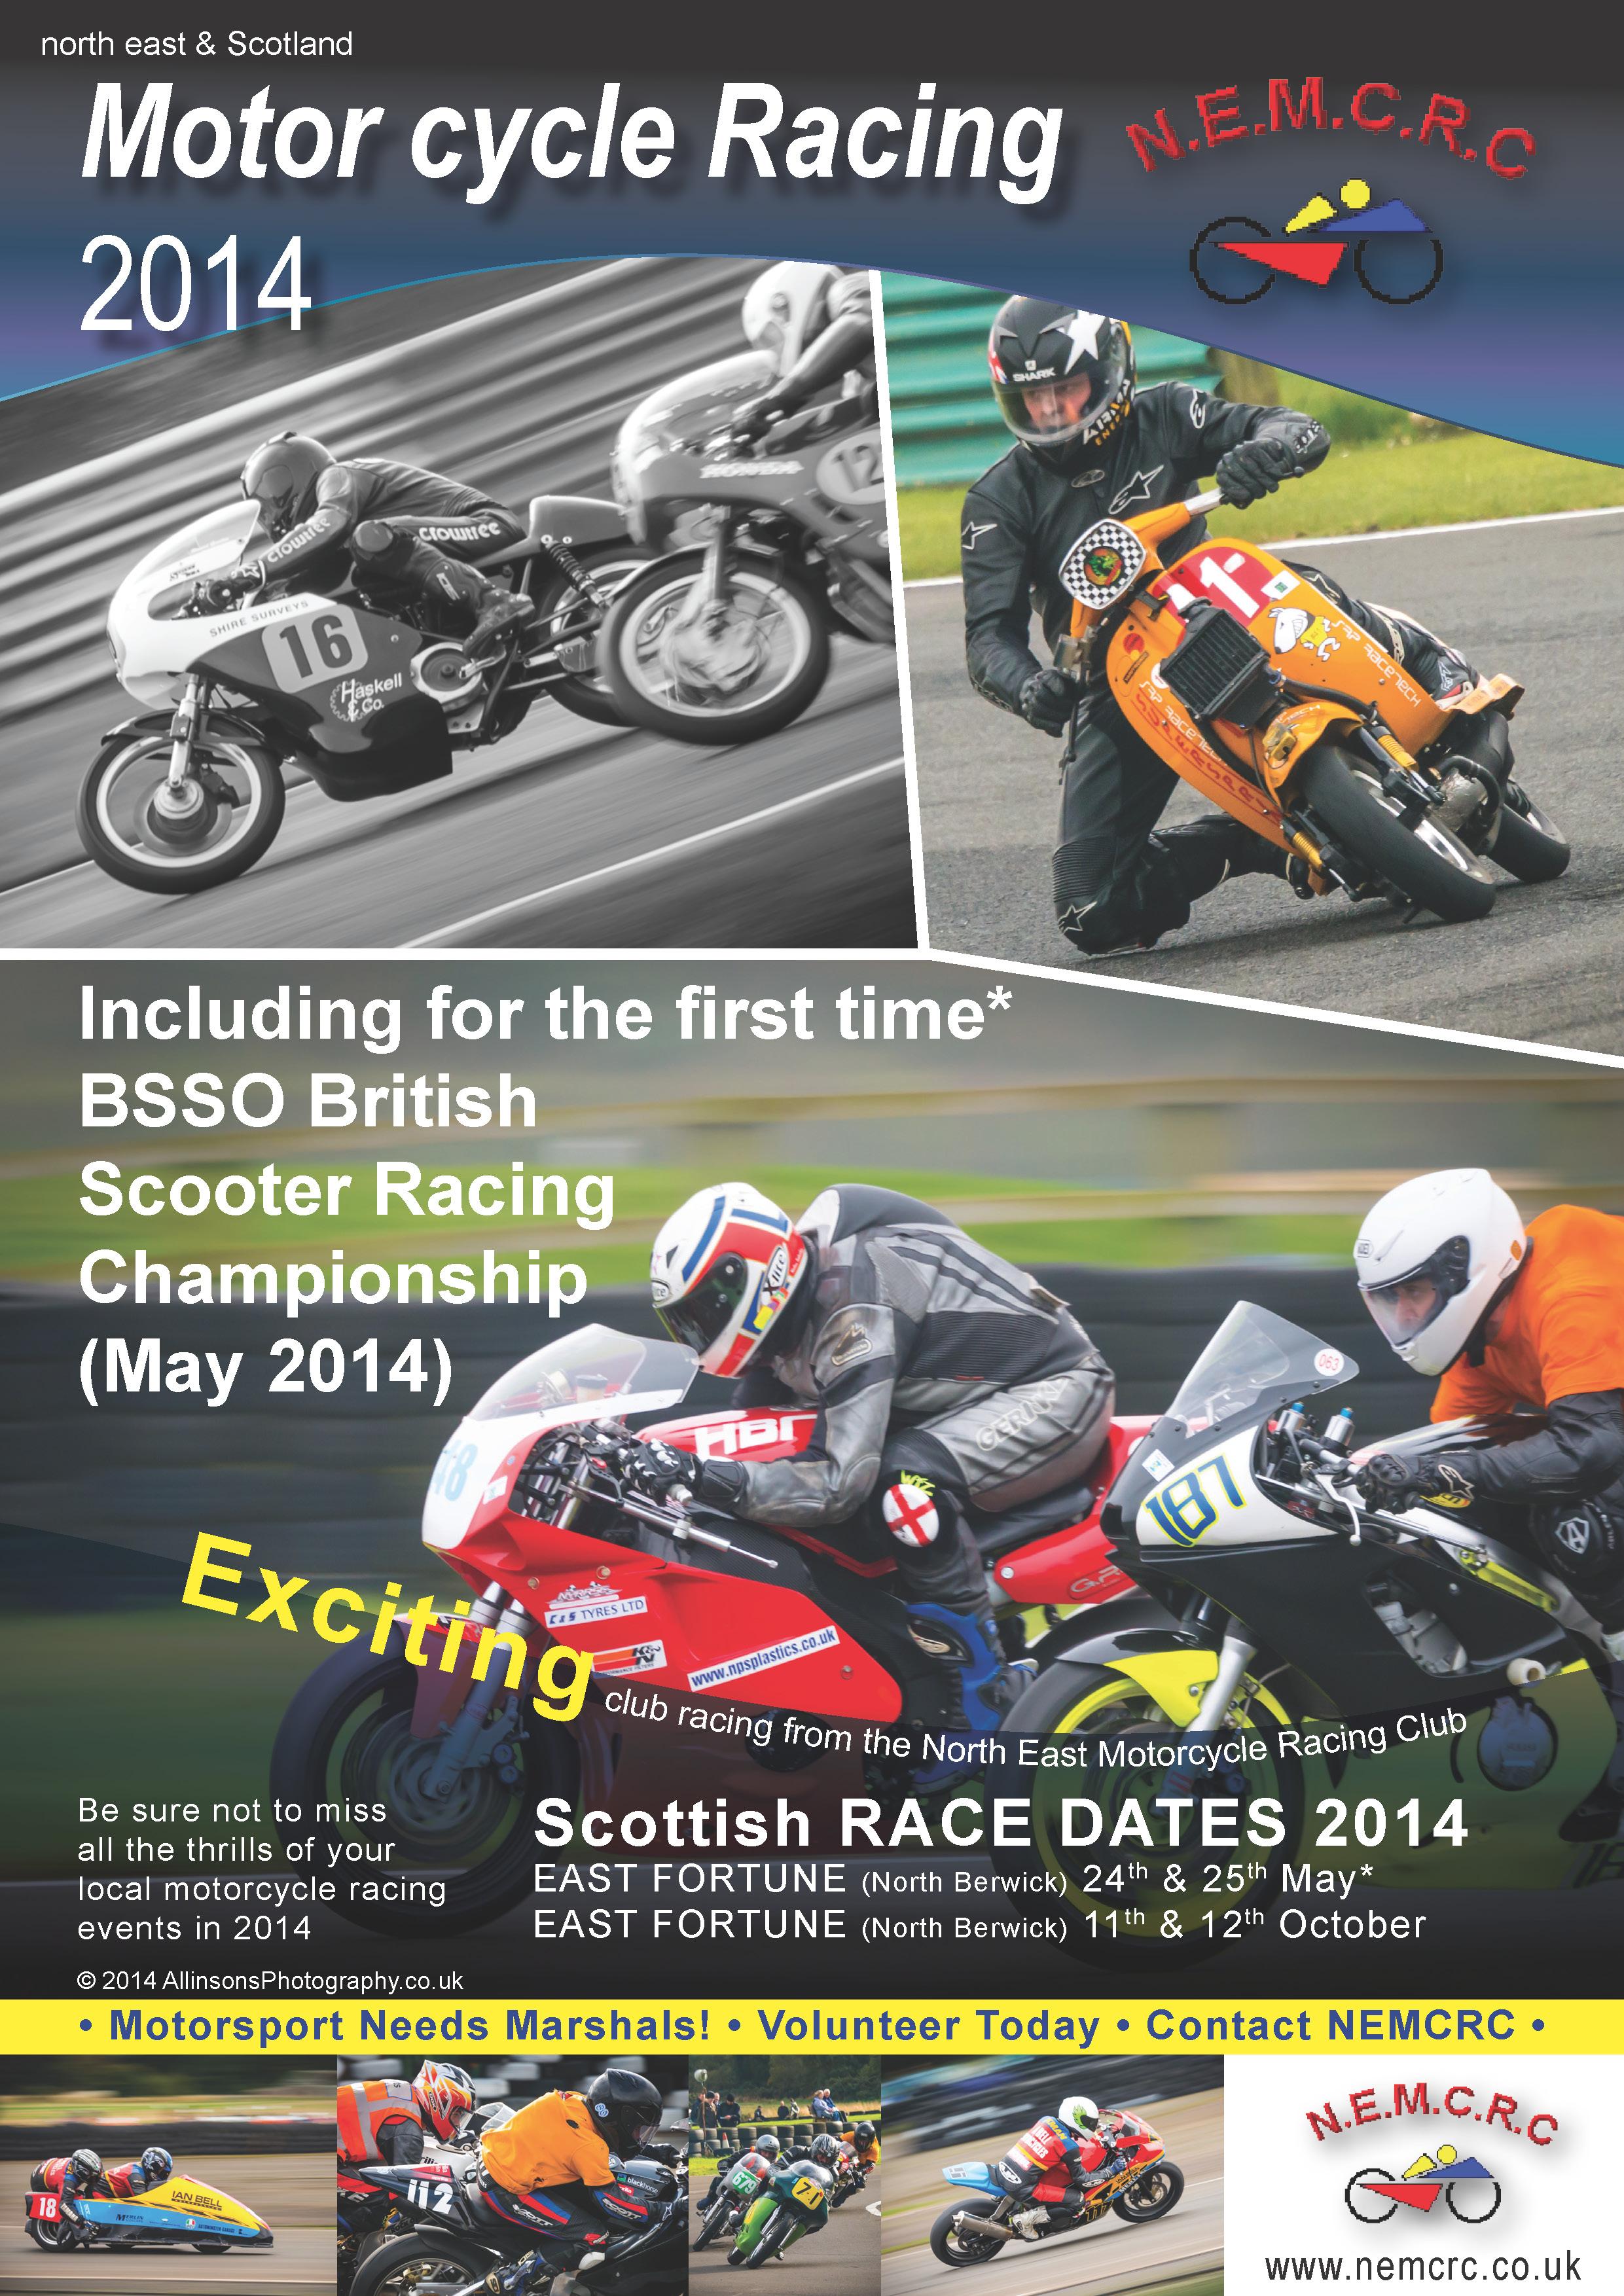 Motorcycle Racing Poster NEMCRC East Fortune 2014